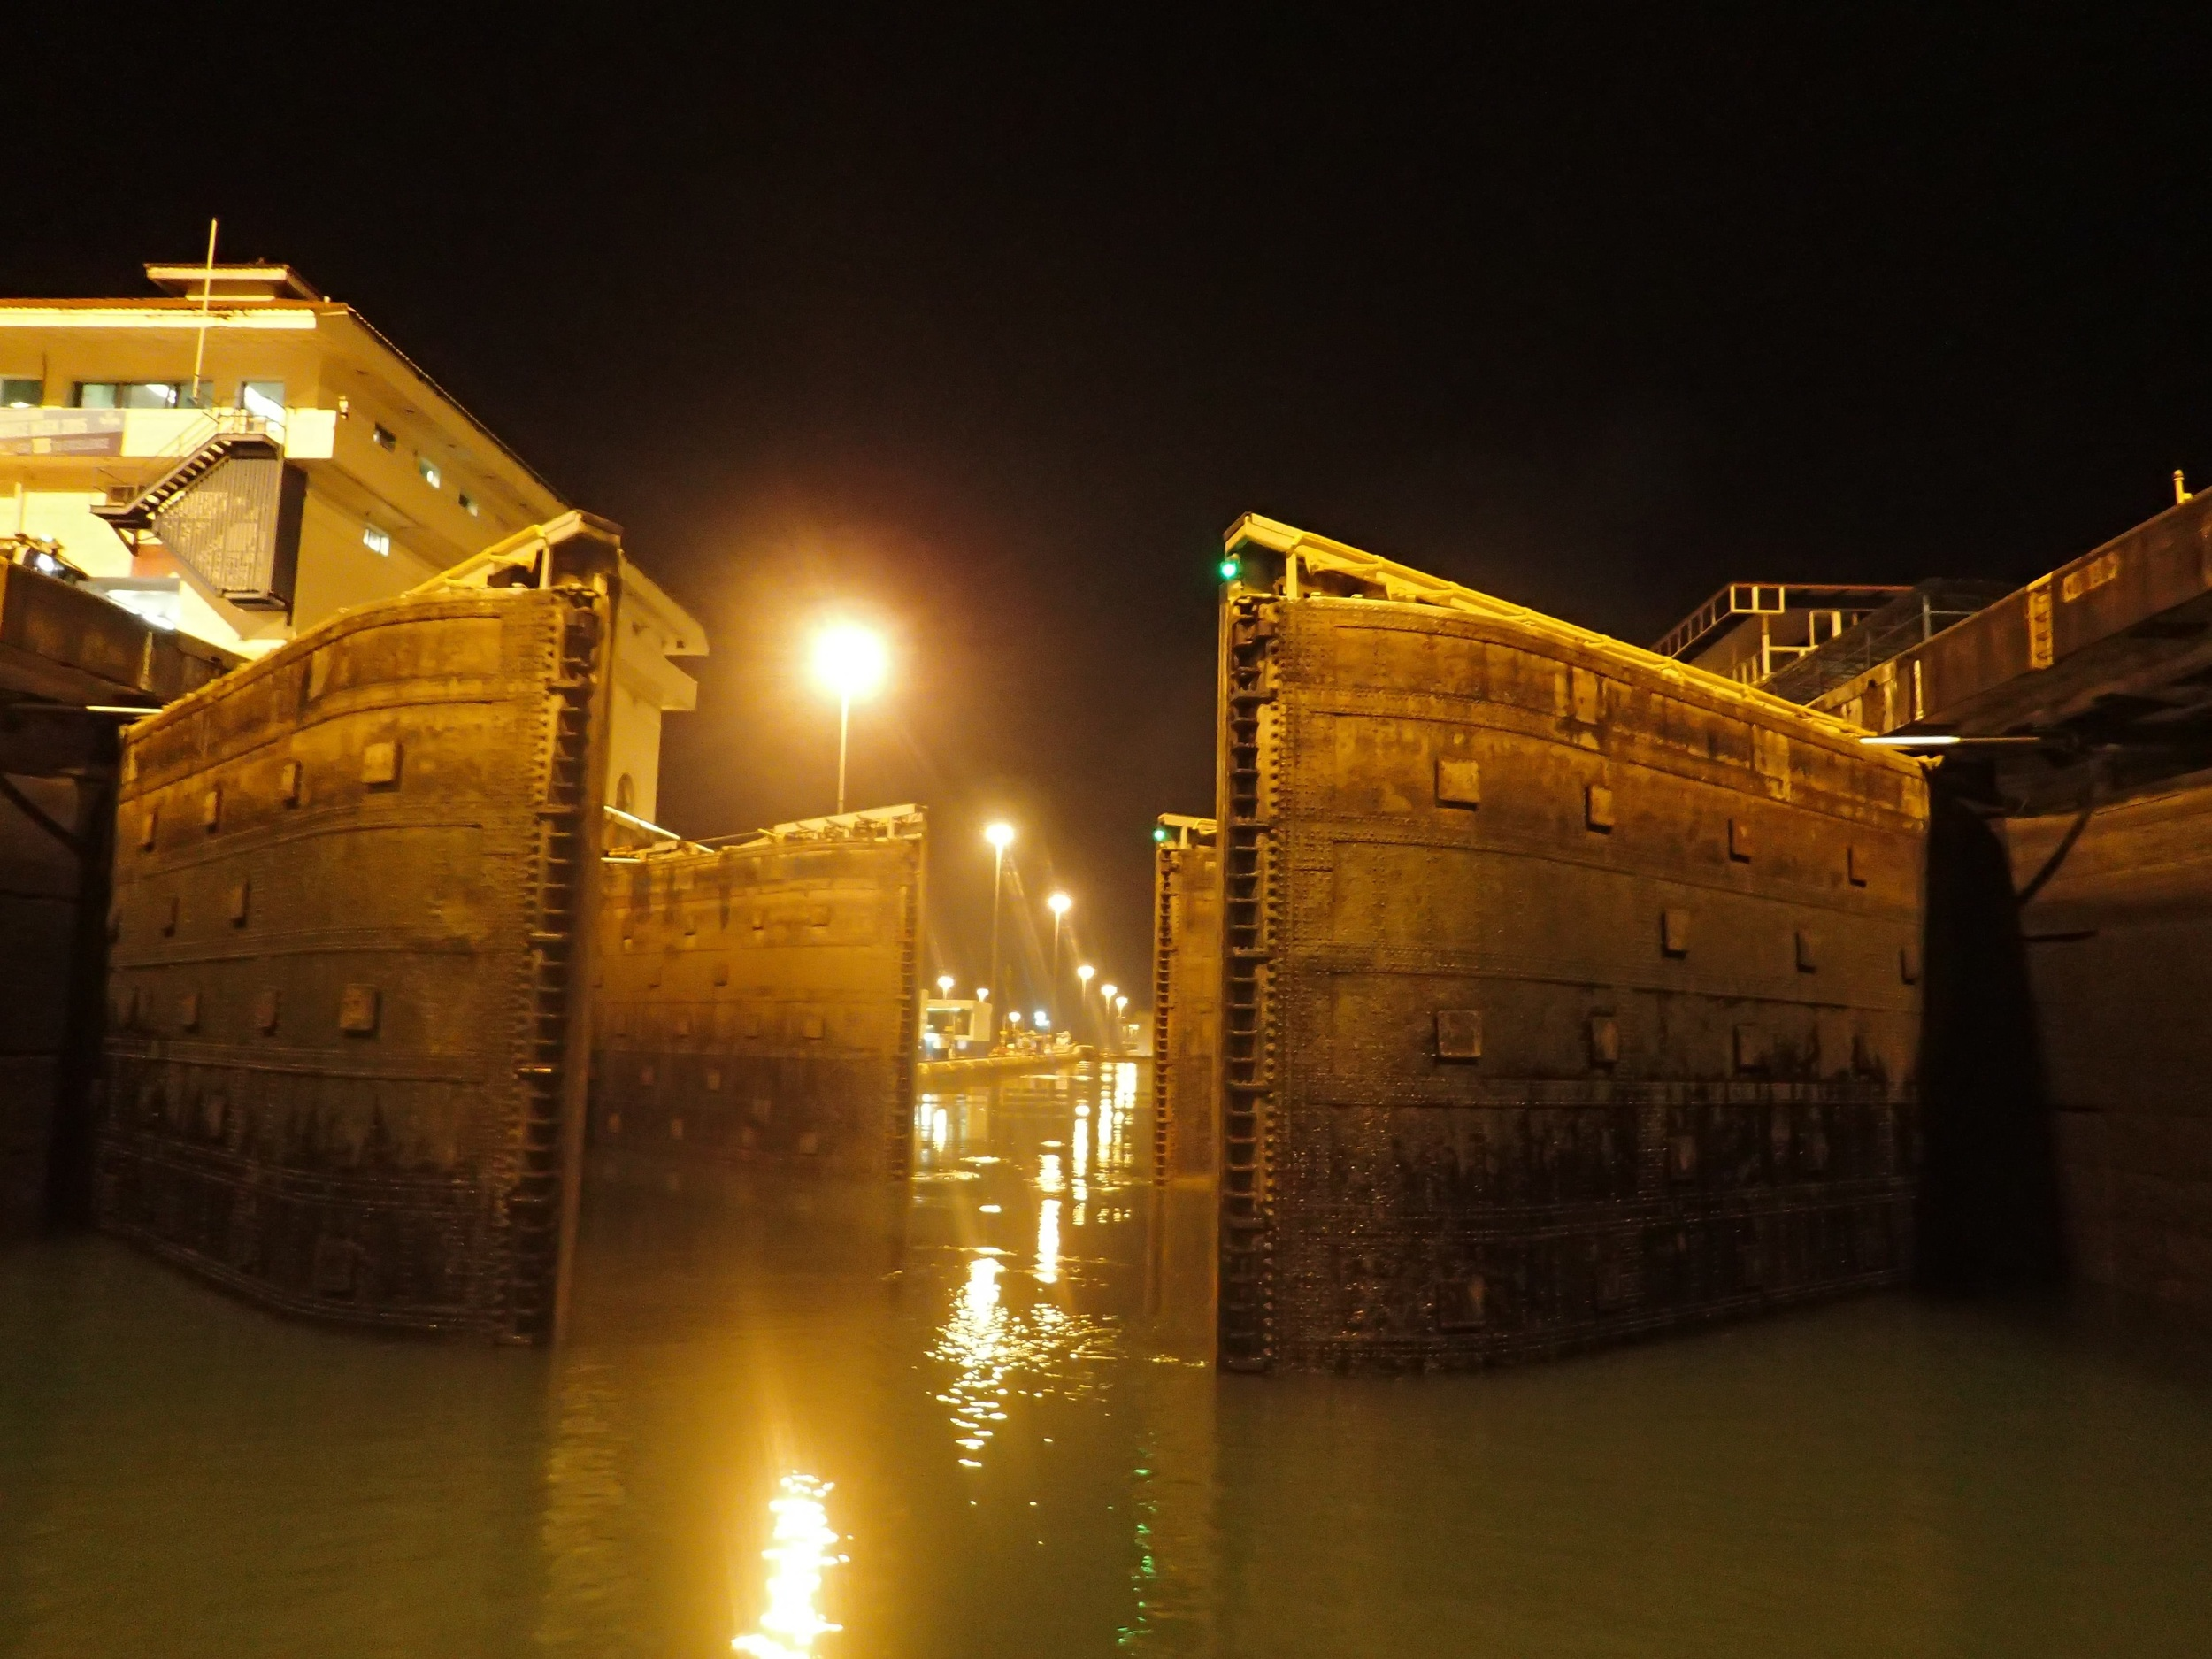 Han's award winning photo - Panama Canal logistics.